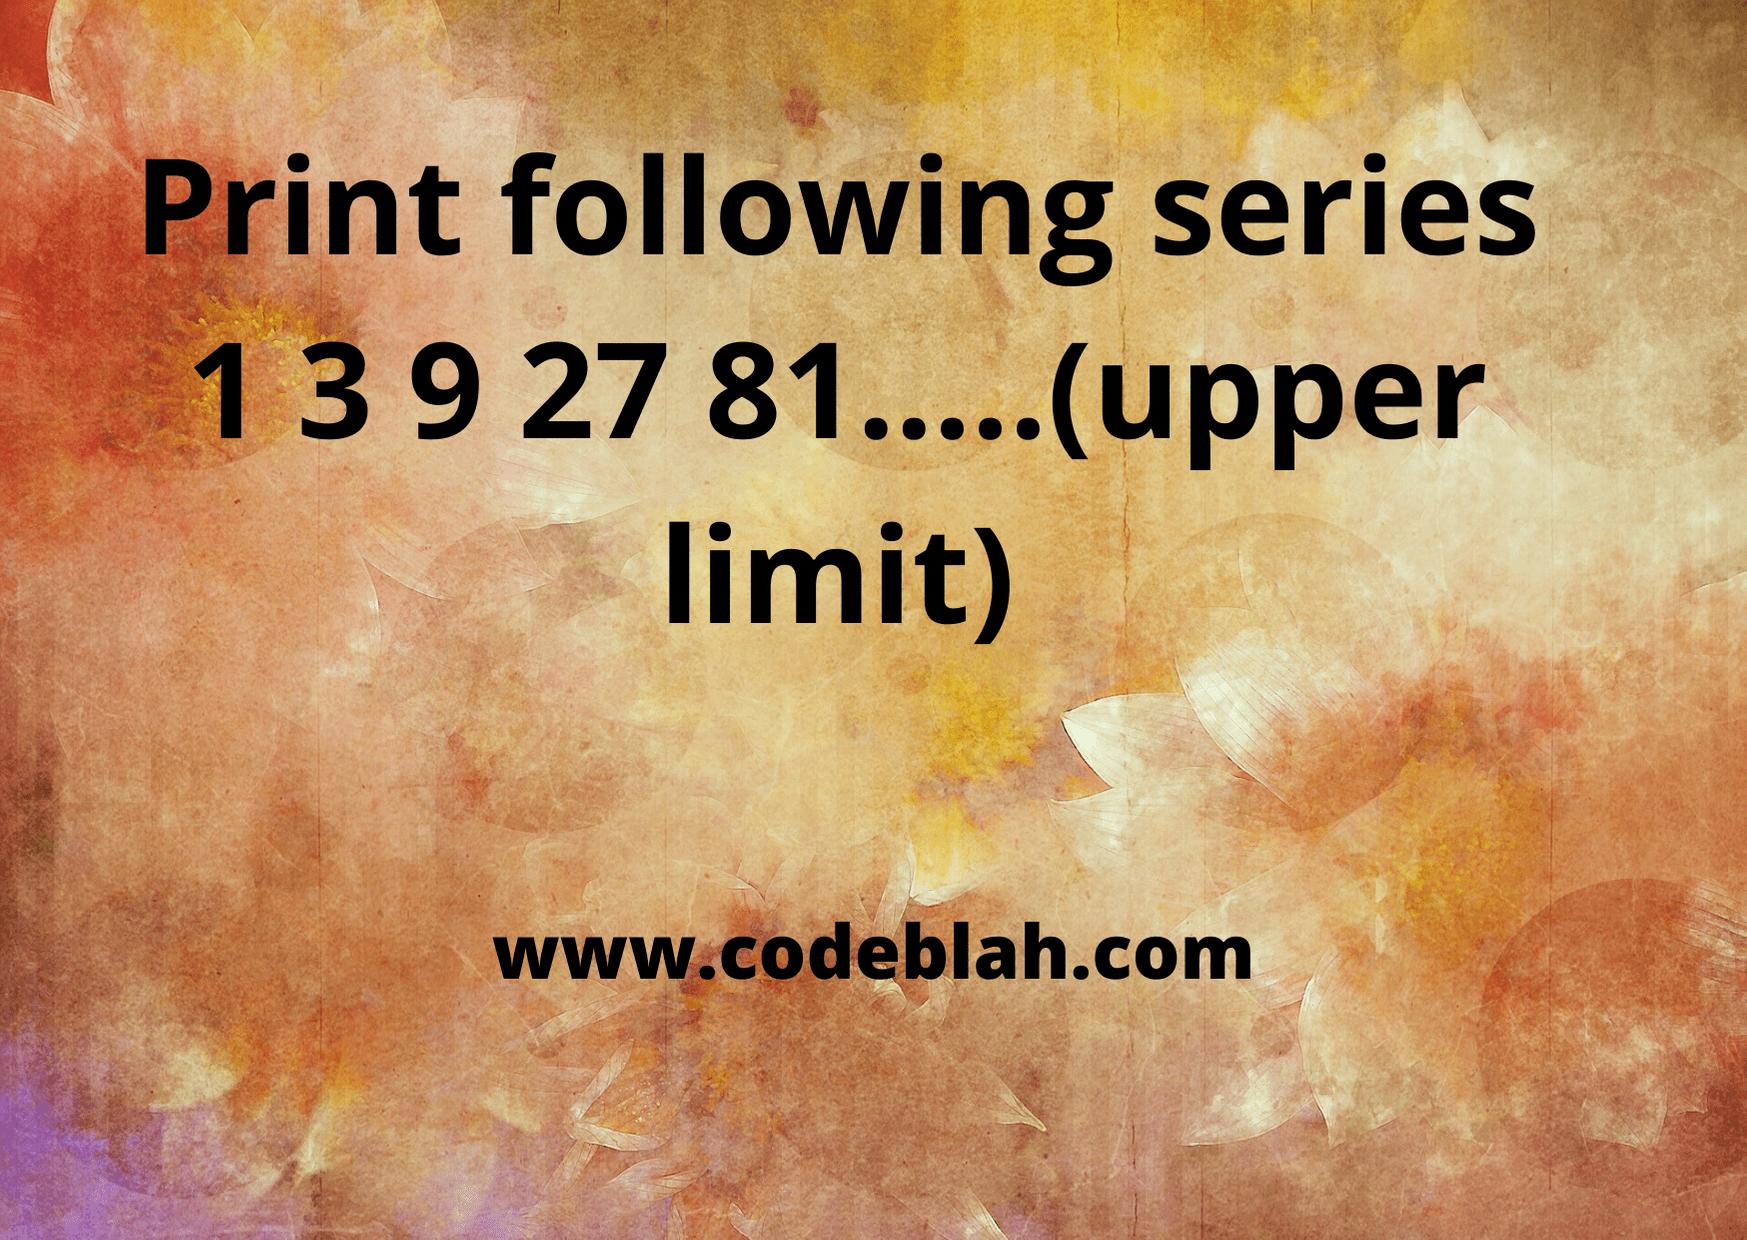 Print following series 1 3 9 27 81 in C